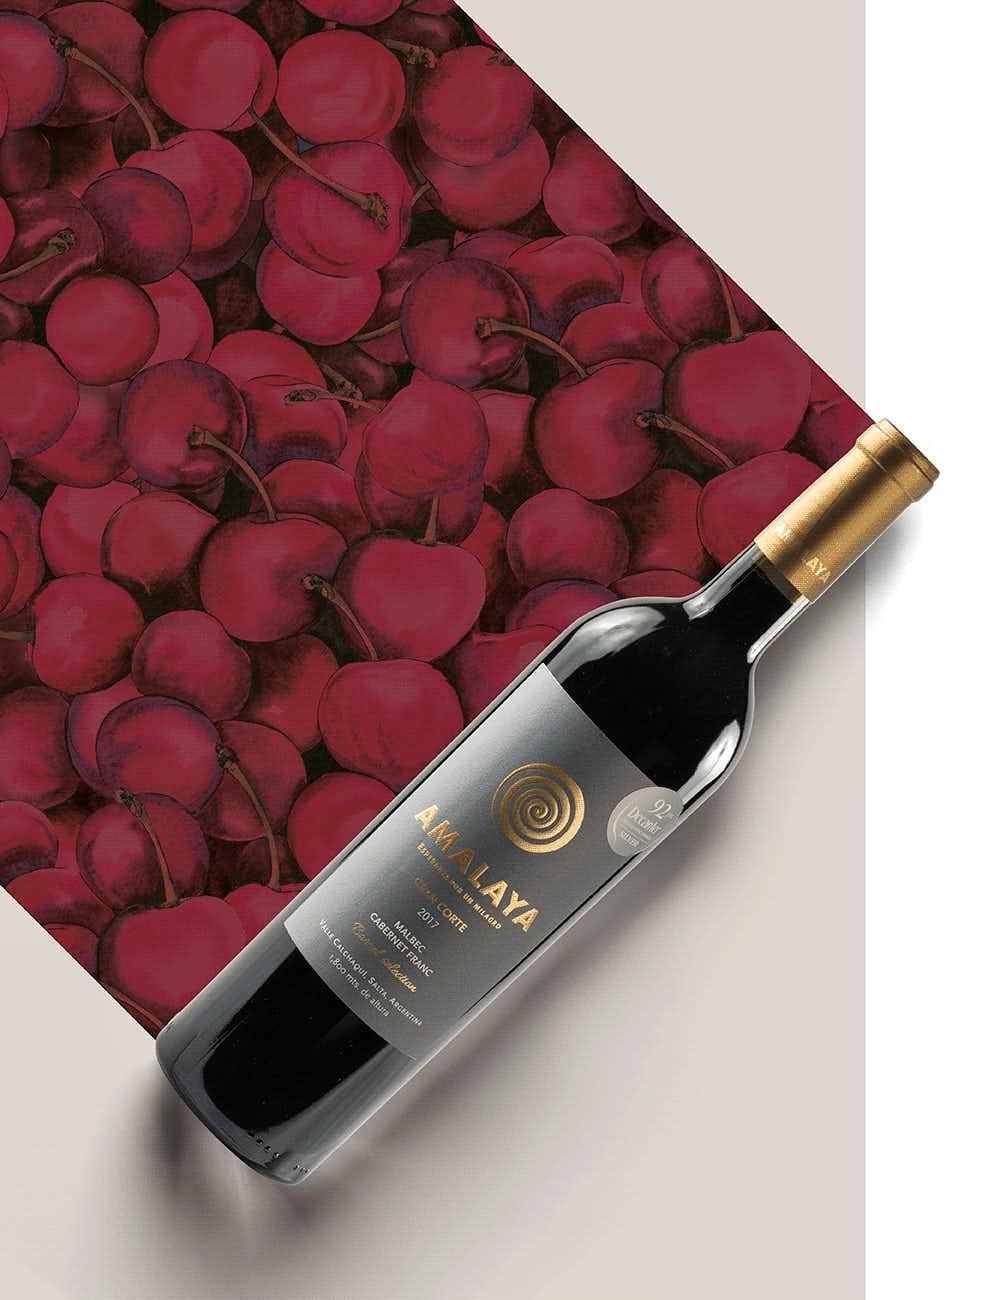 Amalaya Wines Malbec Gran Corte Barrel Selection 2017